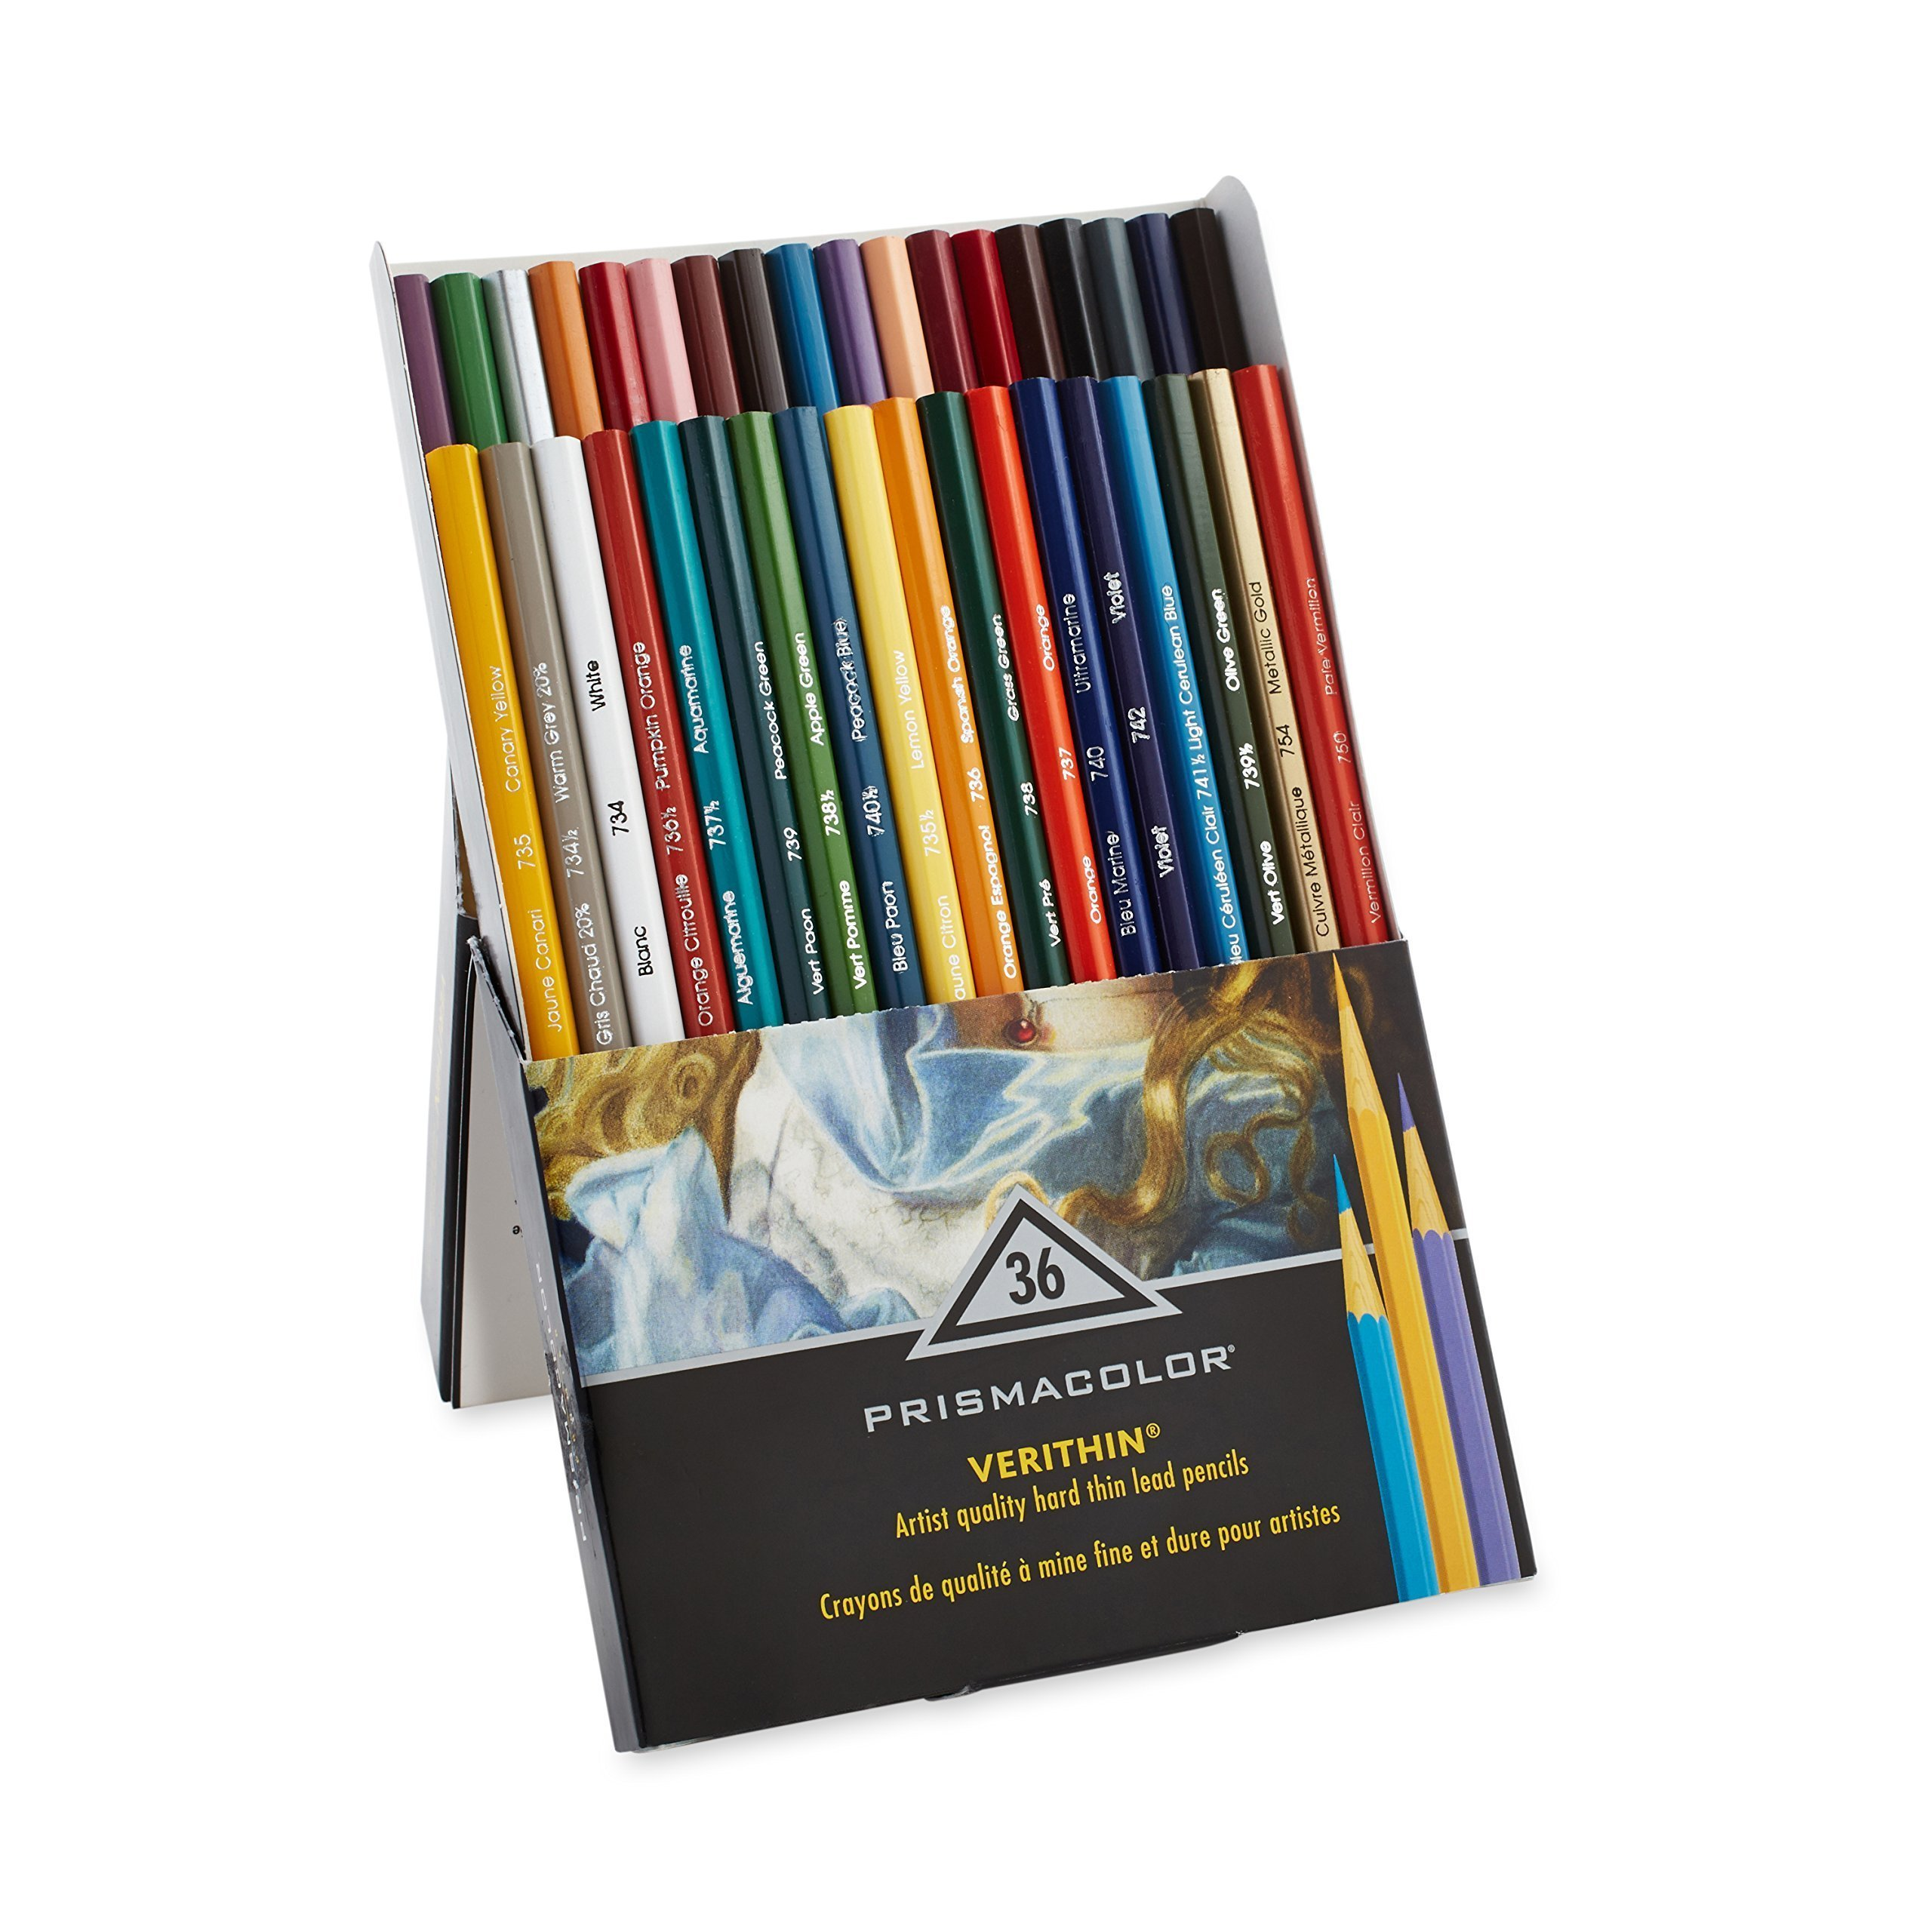 Prismacolor Premier Verithin Colored Pencils, Assorted Colors, 36 Pencils, Pack of 1 Box (2428) by PRISMACOLOR